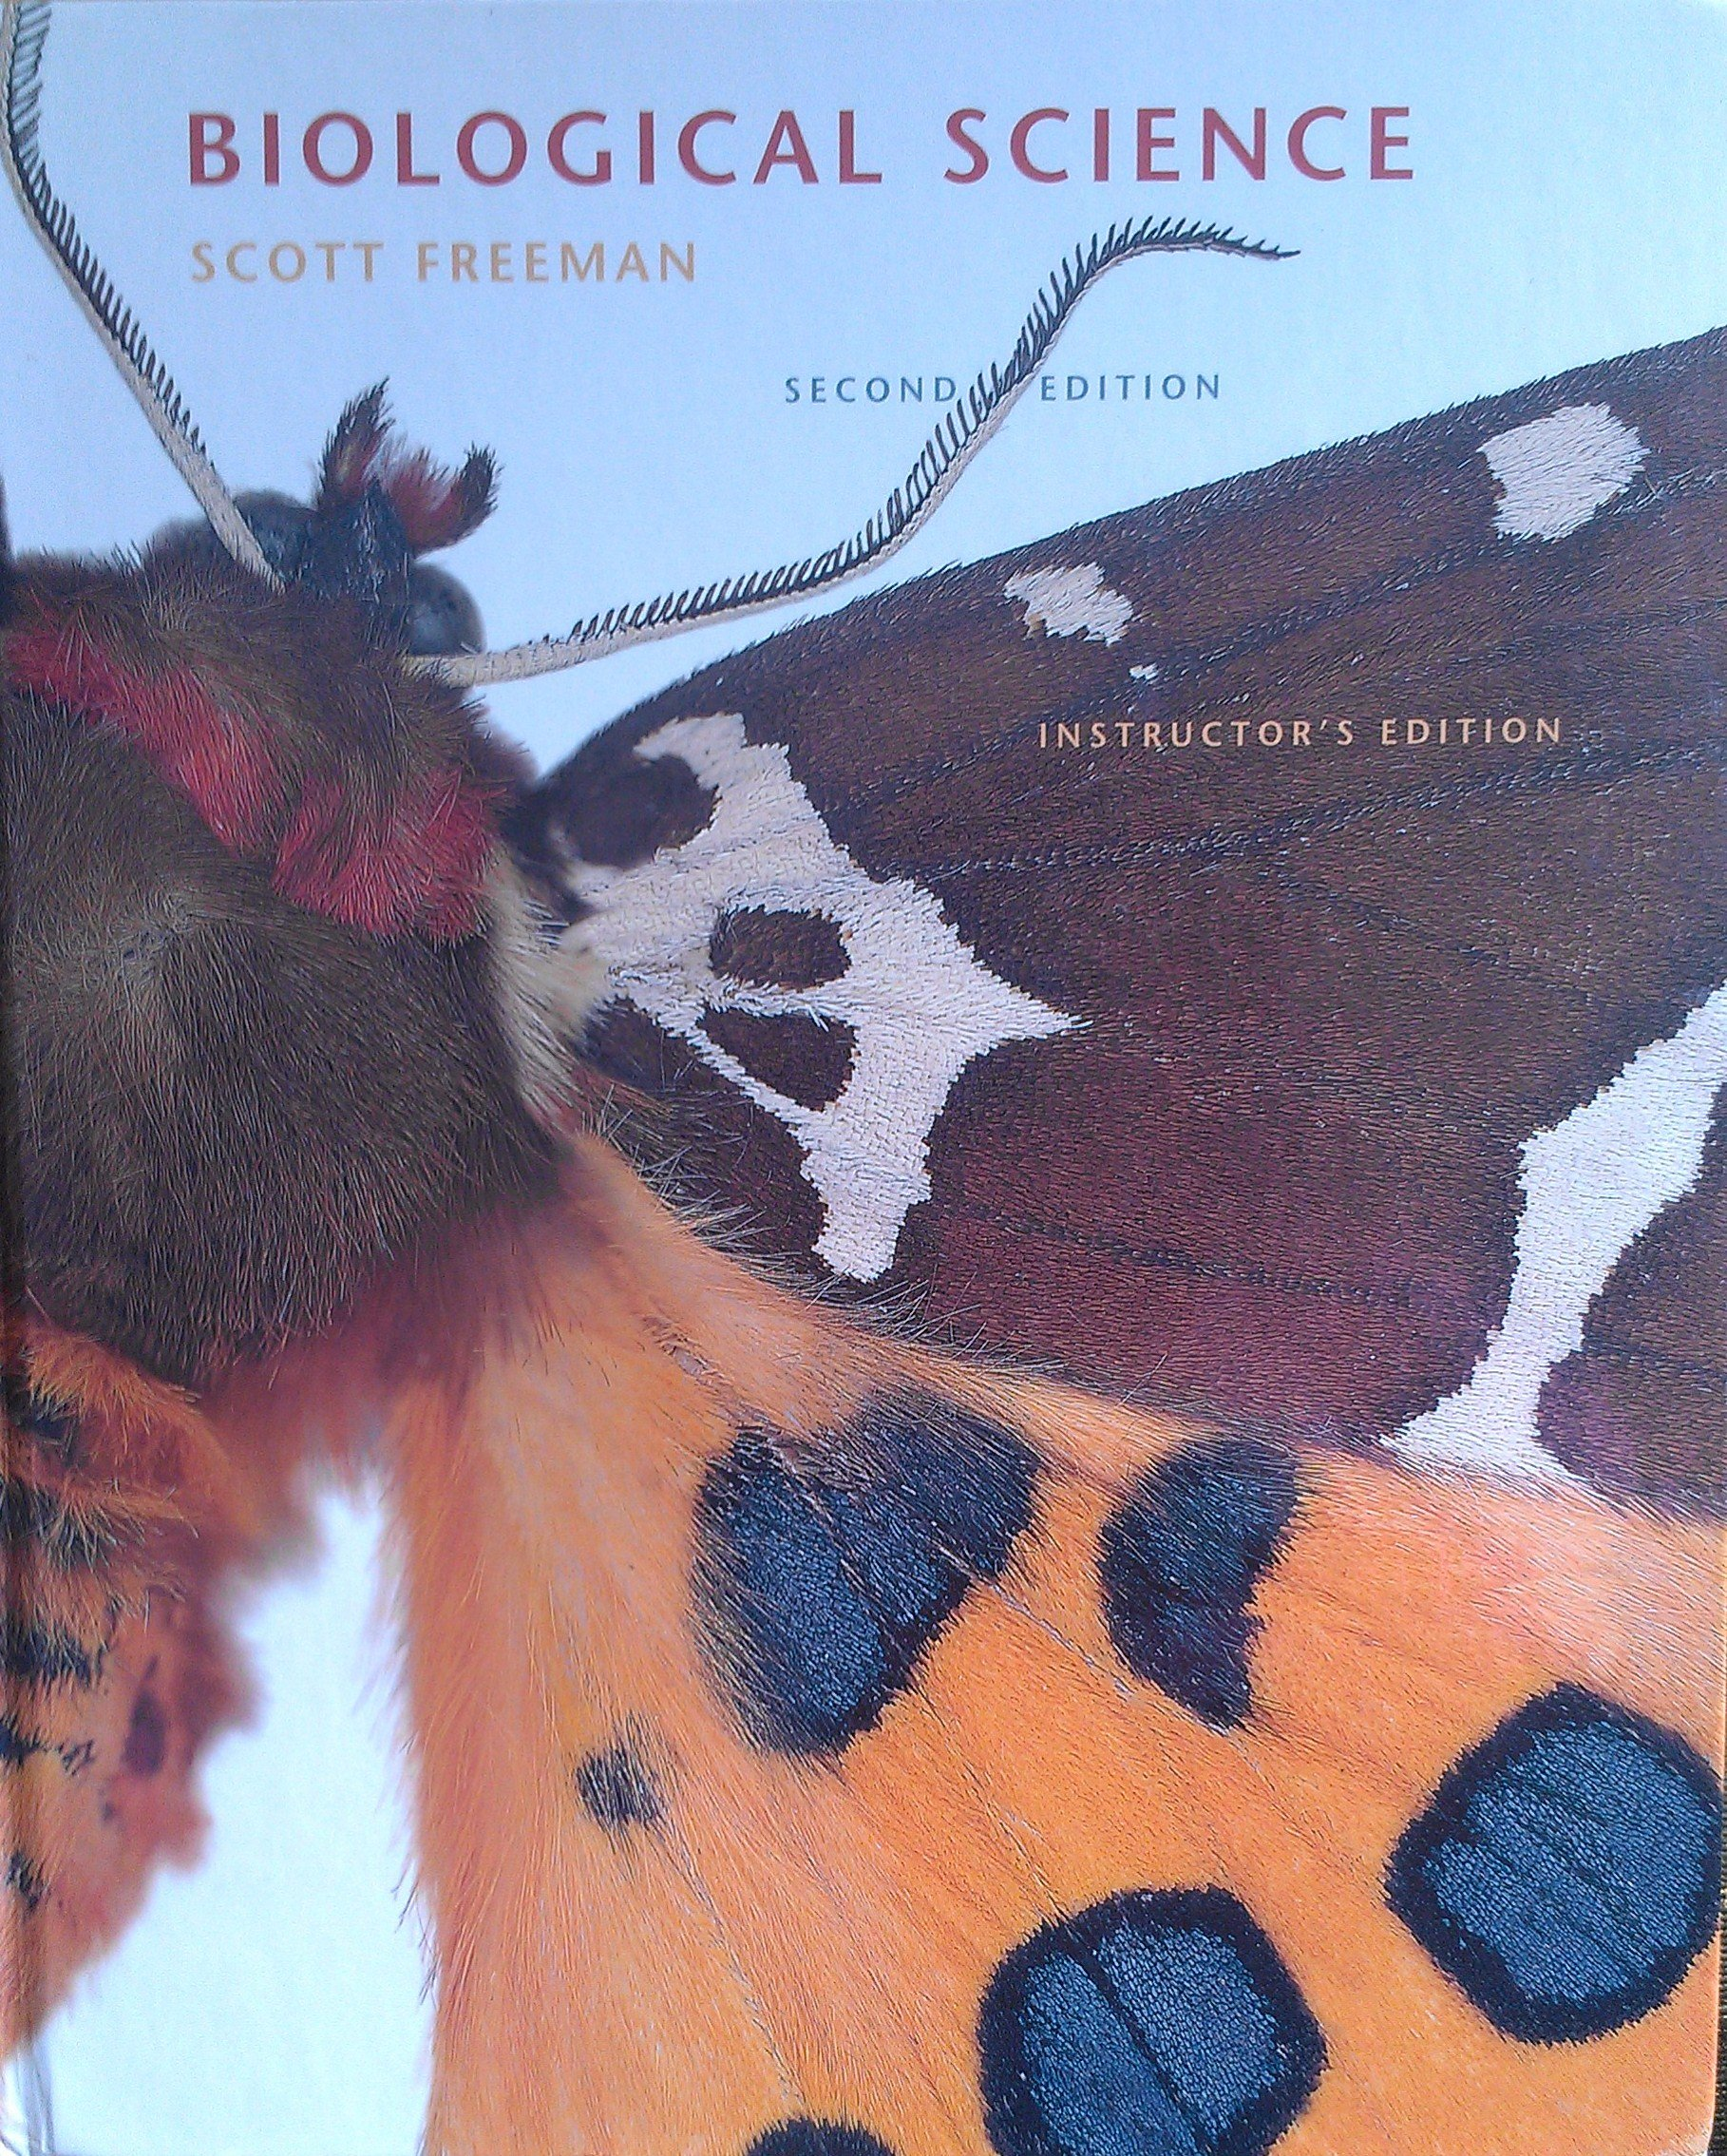 Biological Science 1st Edition (First Edition By Scott Freeman): Scott  Freeman: Amazon.com: Books